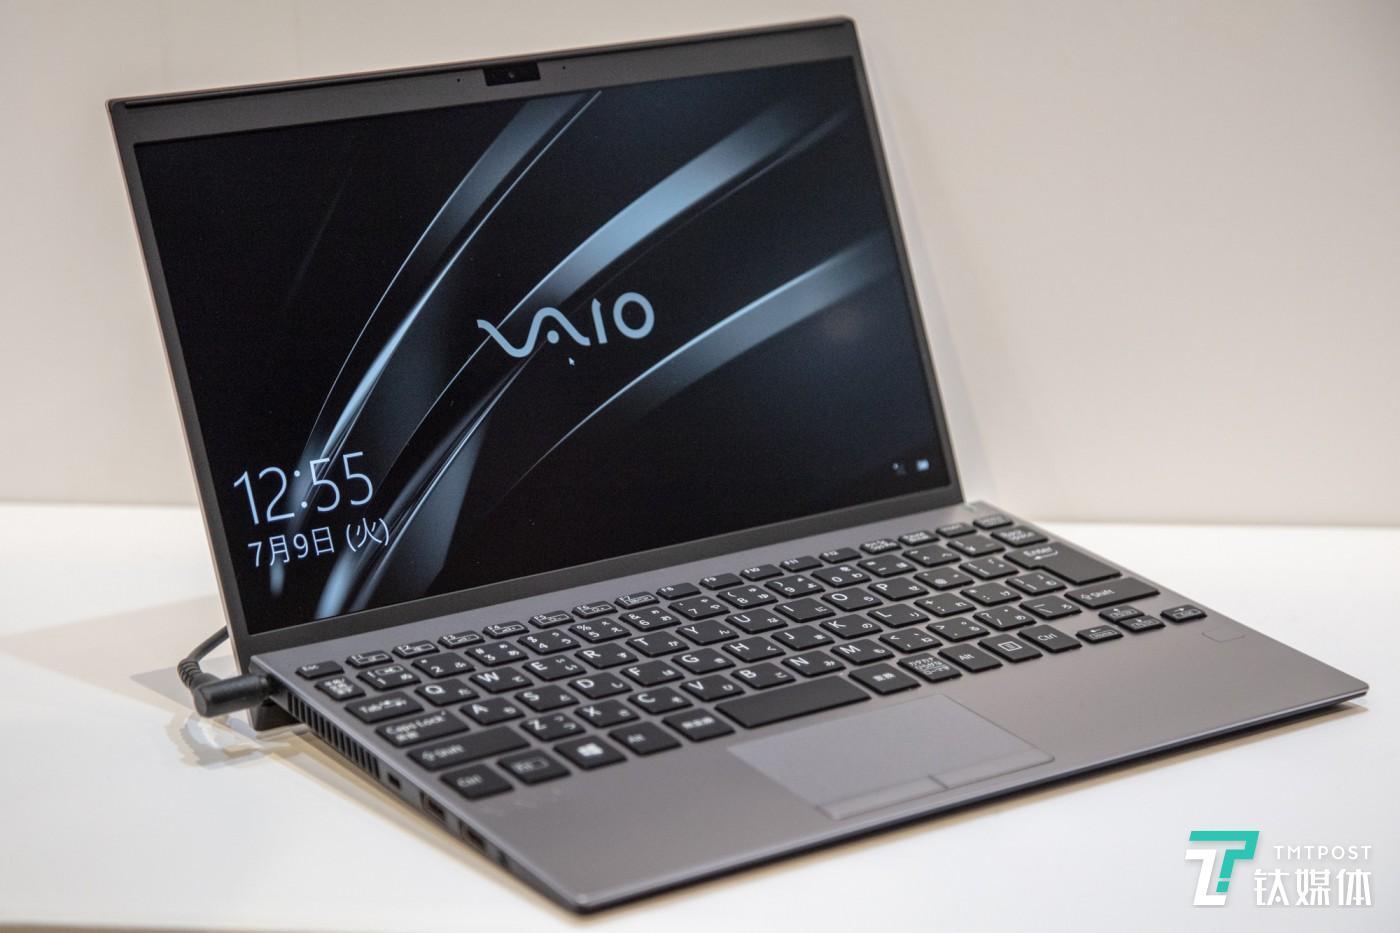 VAIO SX12笔记本电脑